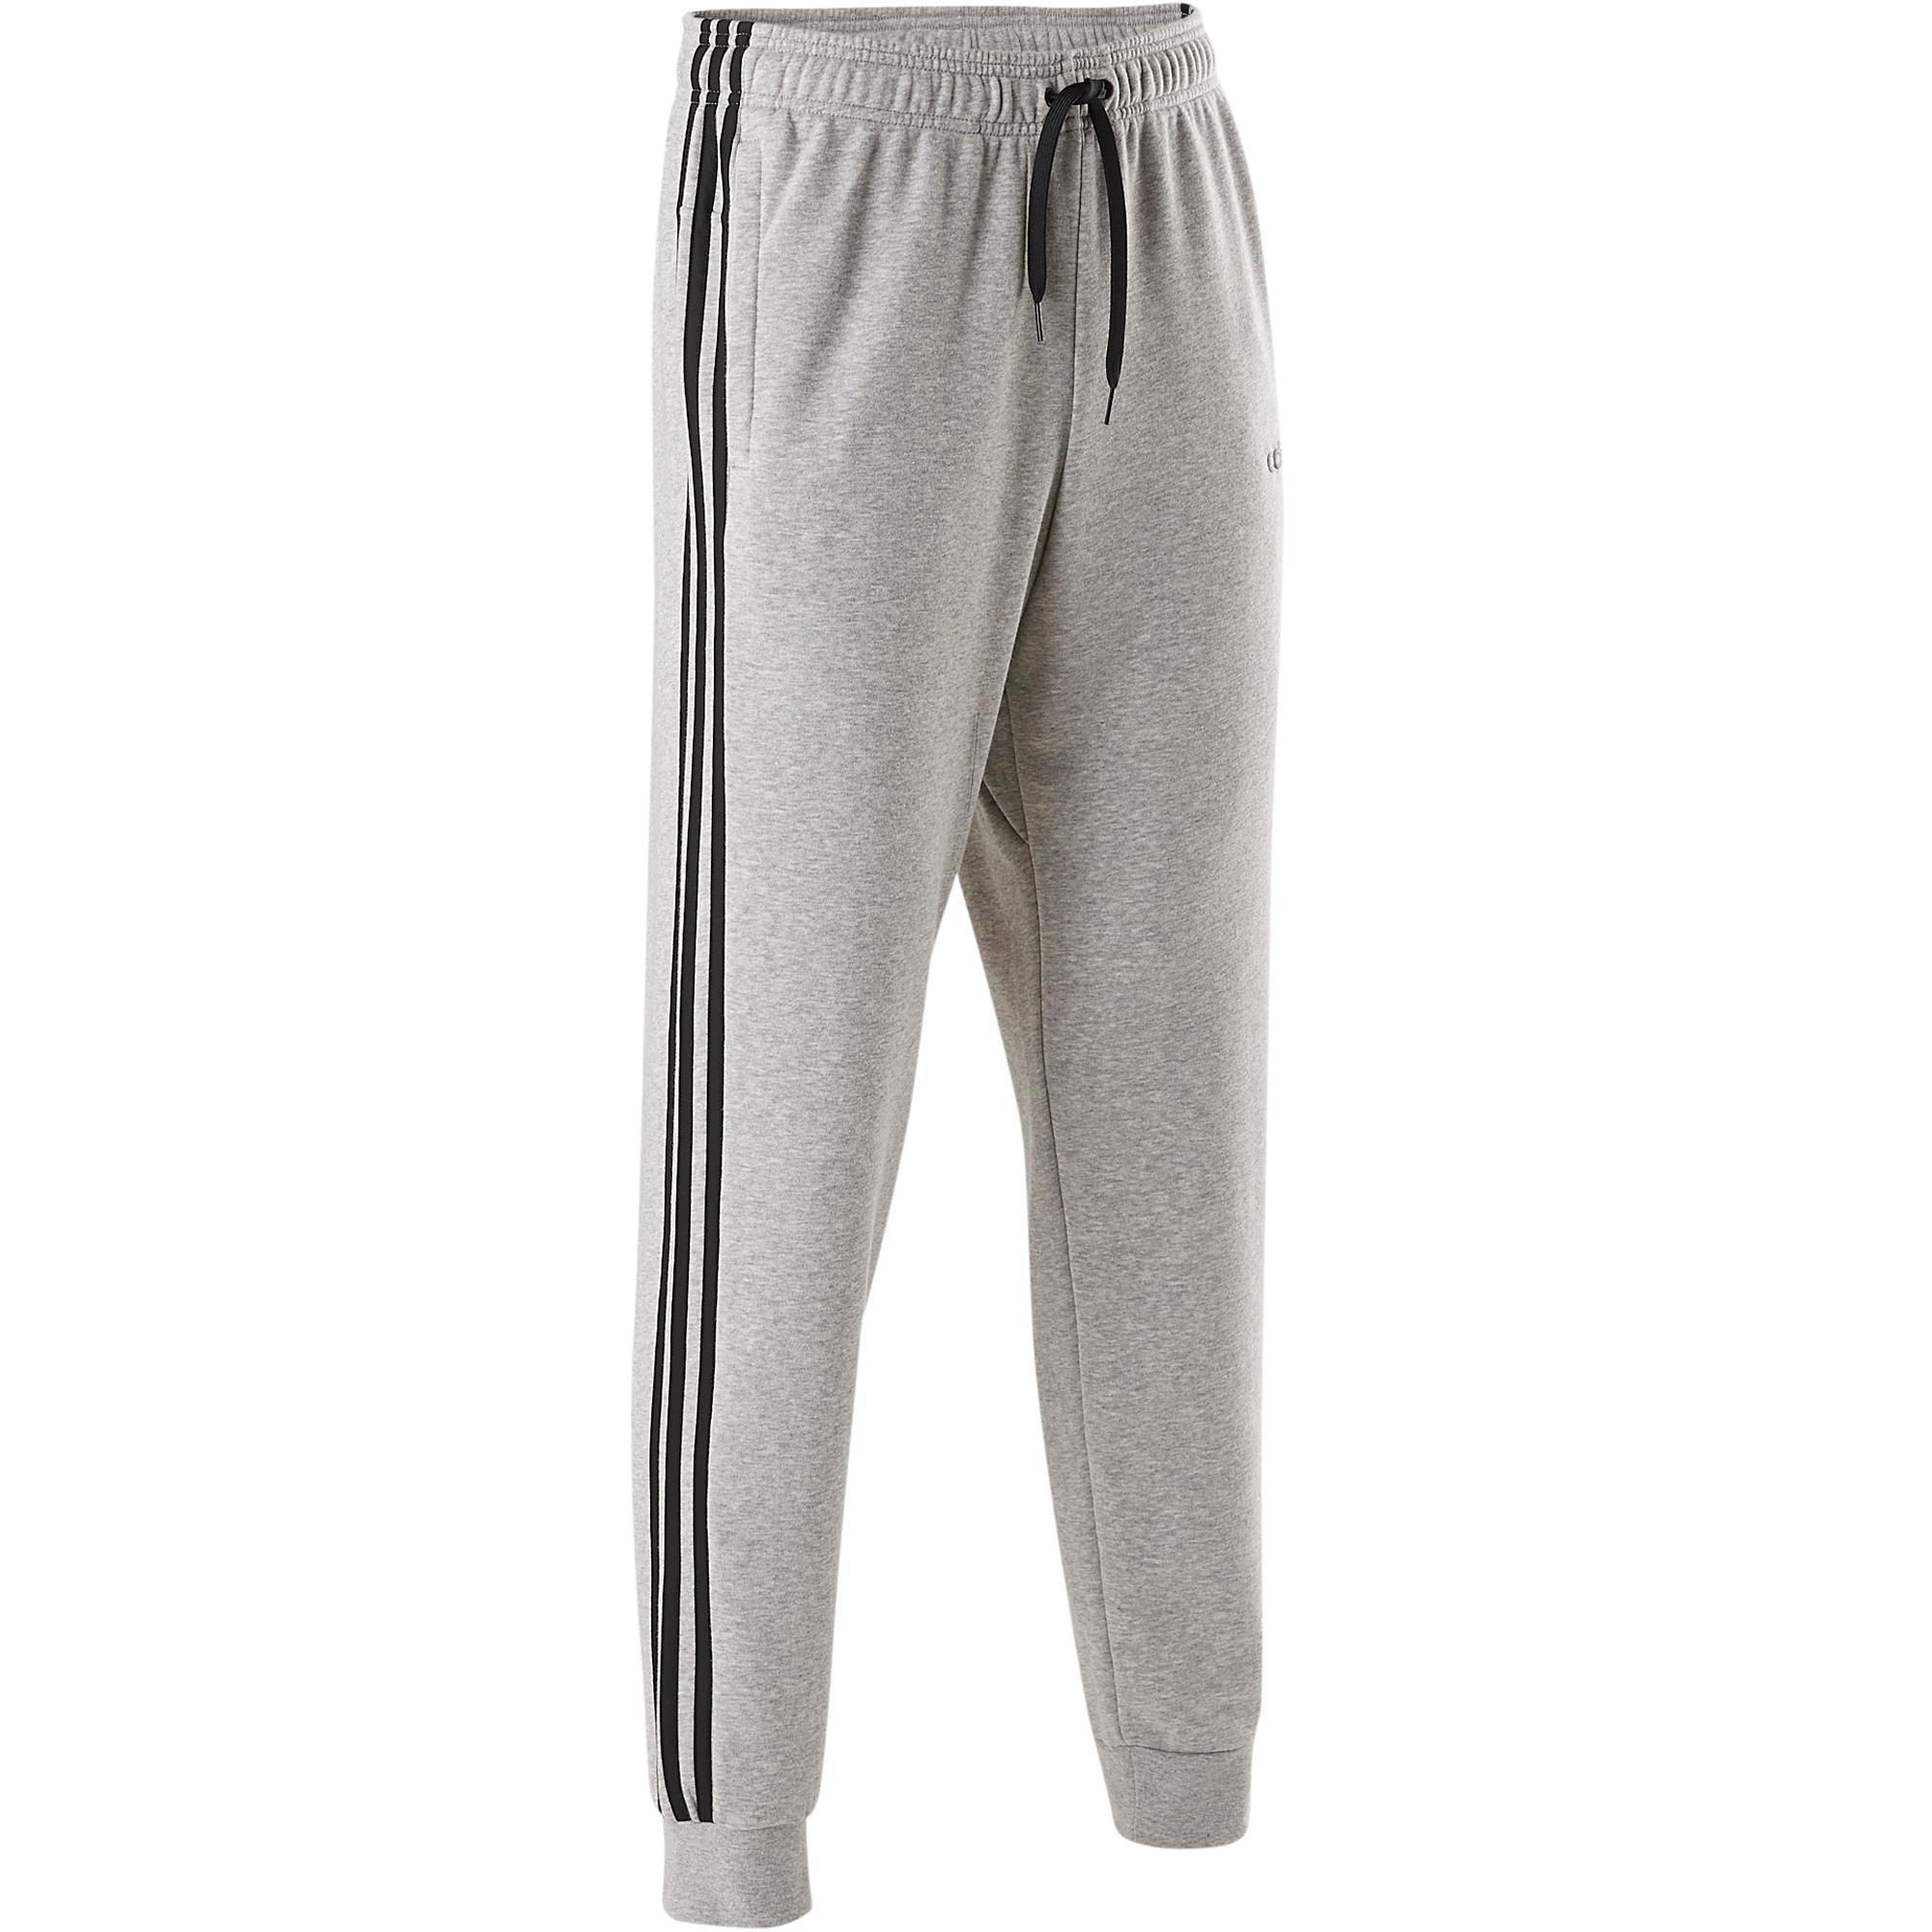 suave Pantalón hombre 3S Gimnasia y Adidas gris Pilates w7Hq7U6 63cc540799d6